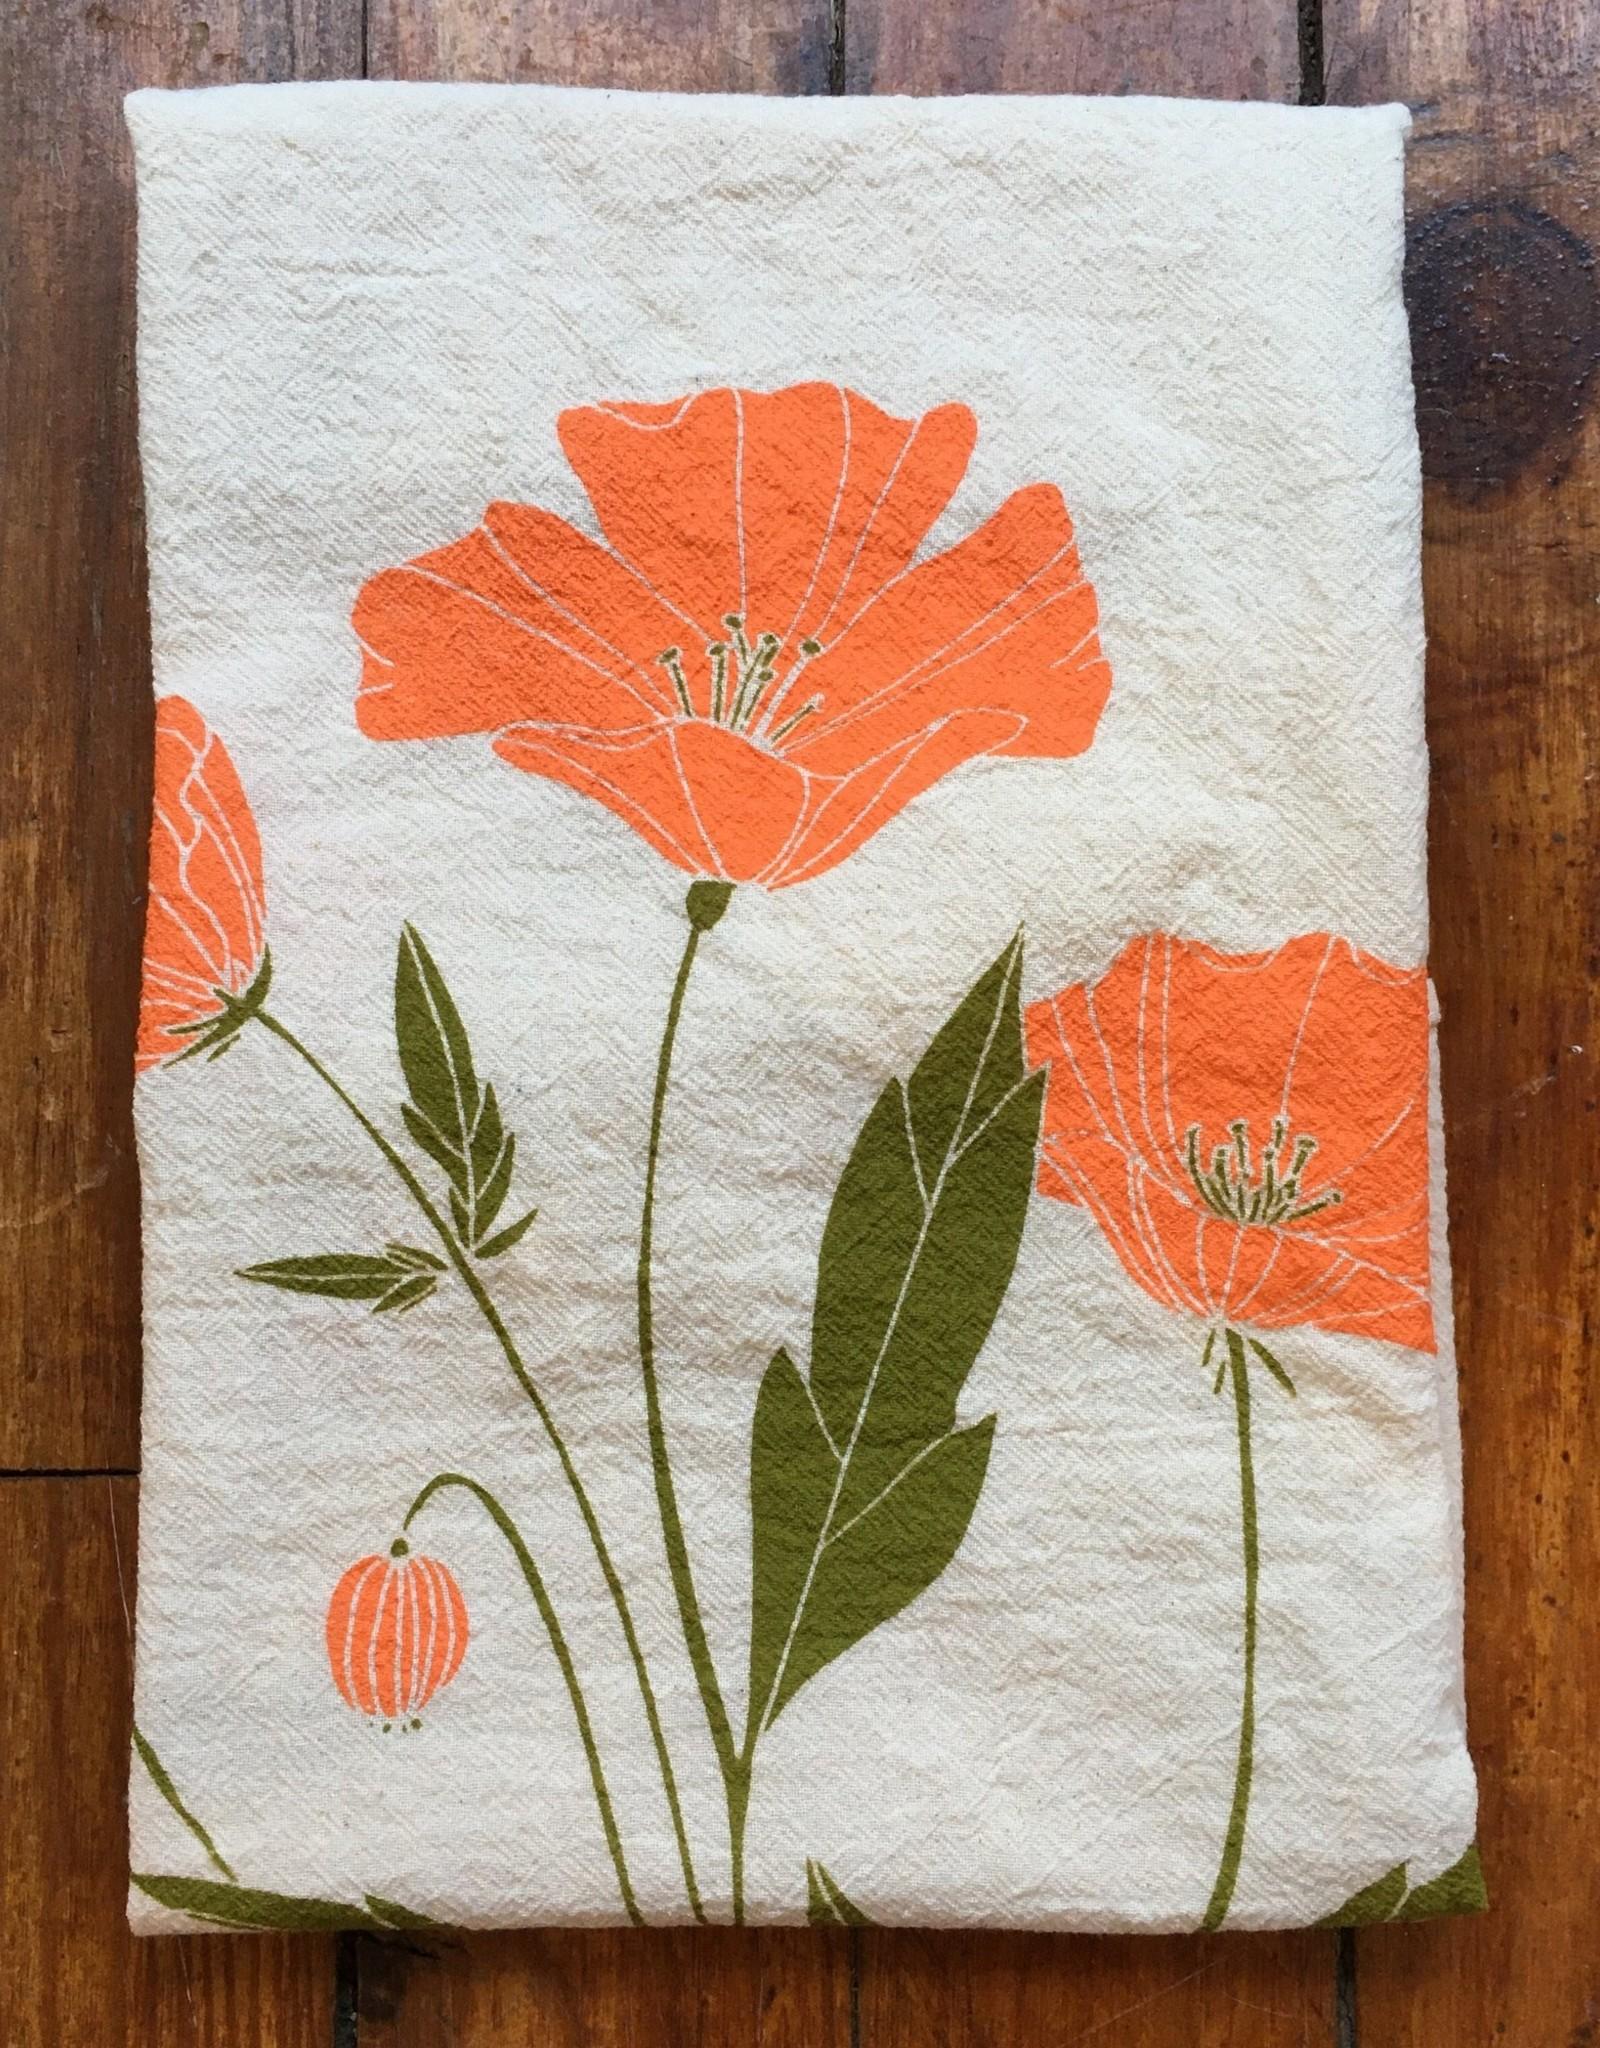 Noon Designs Tea Towels by Noon Designs